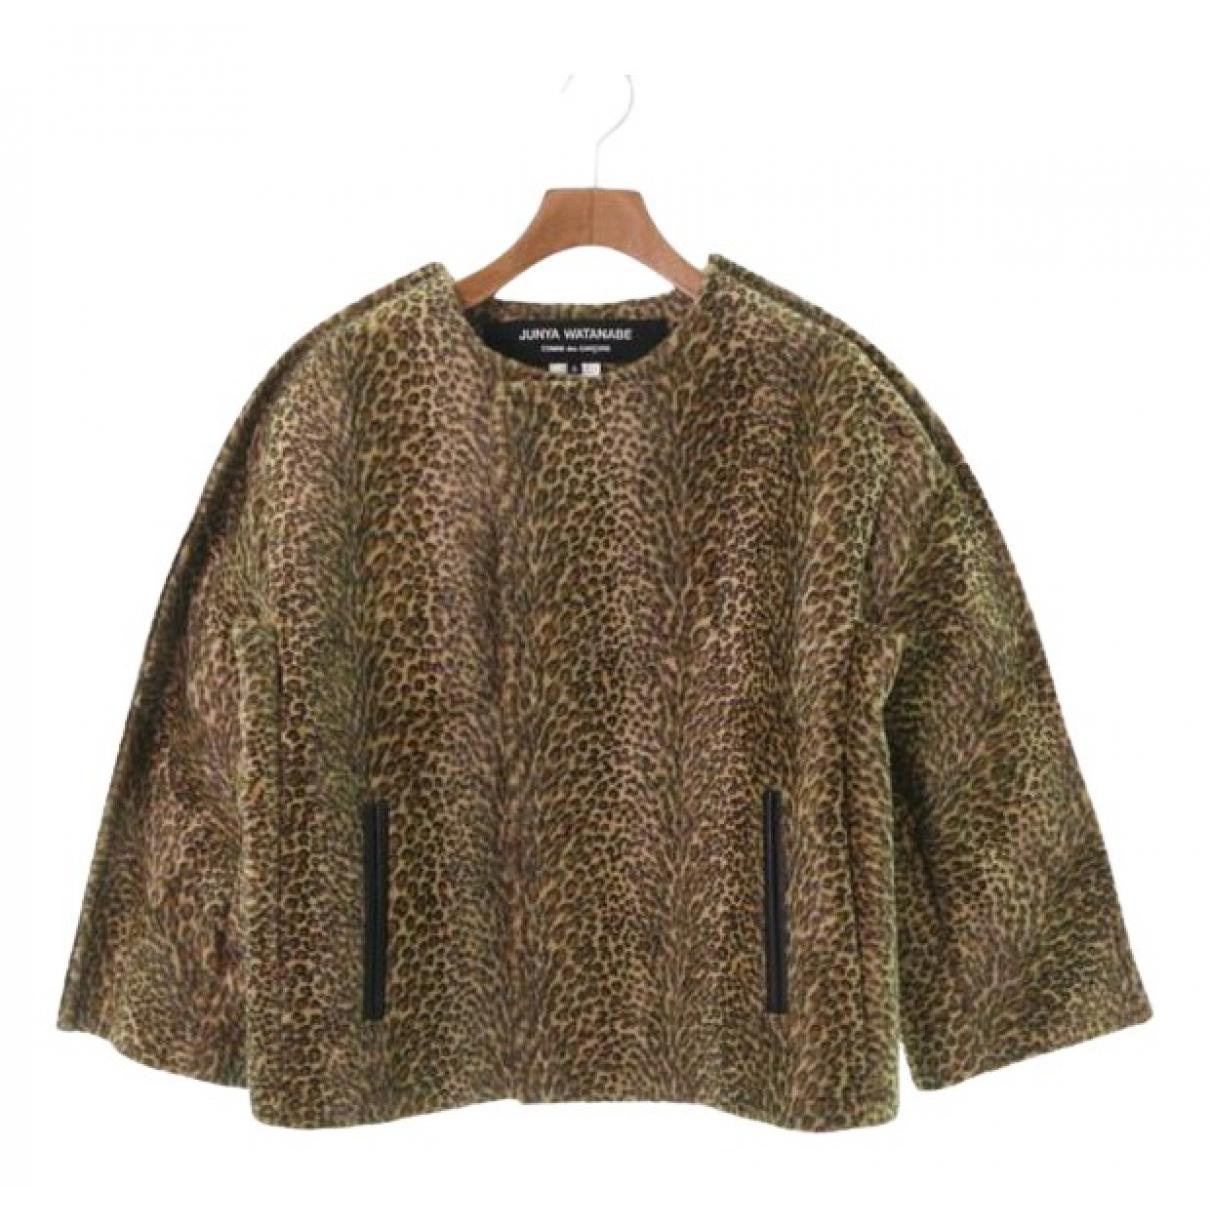 Junya Watanabe N Beige Cotton jacket for Women S International